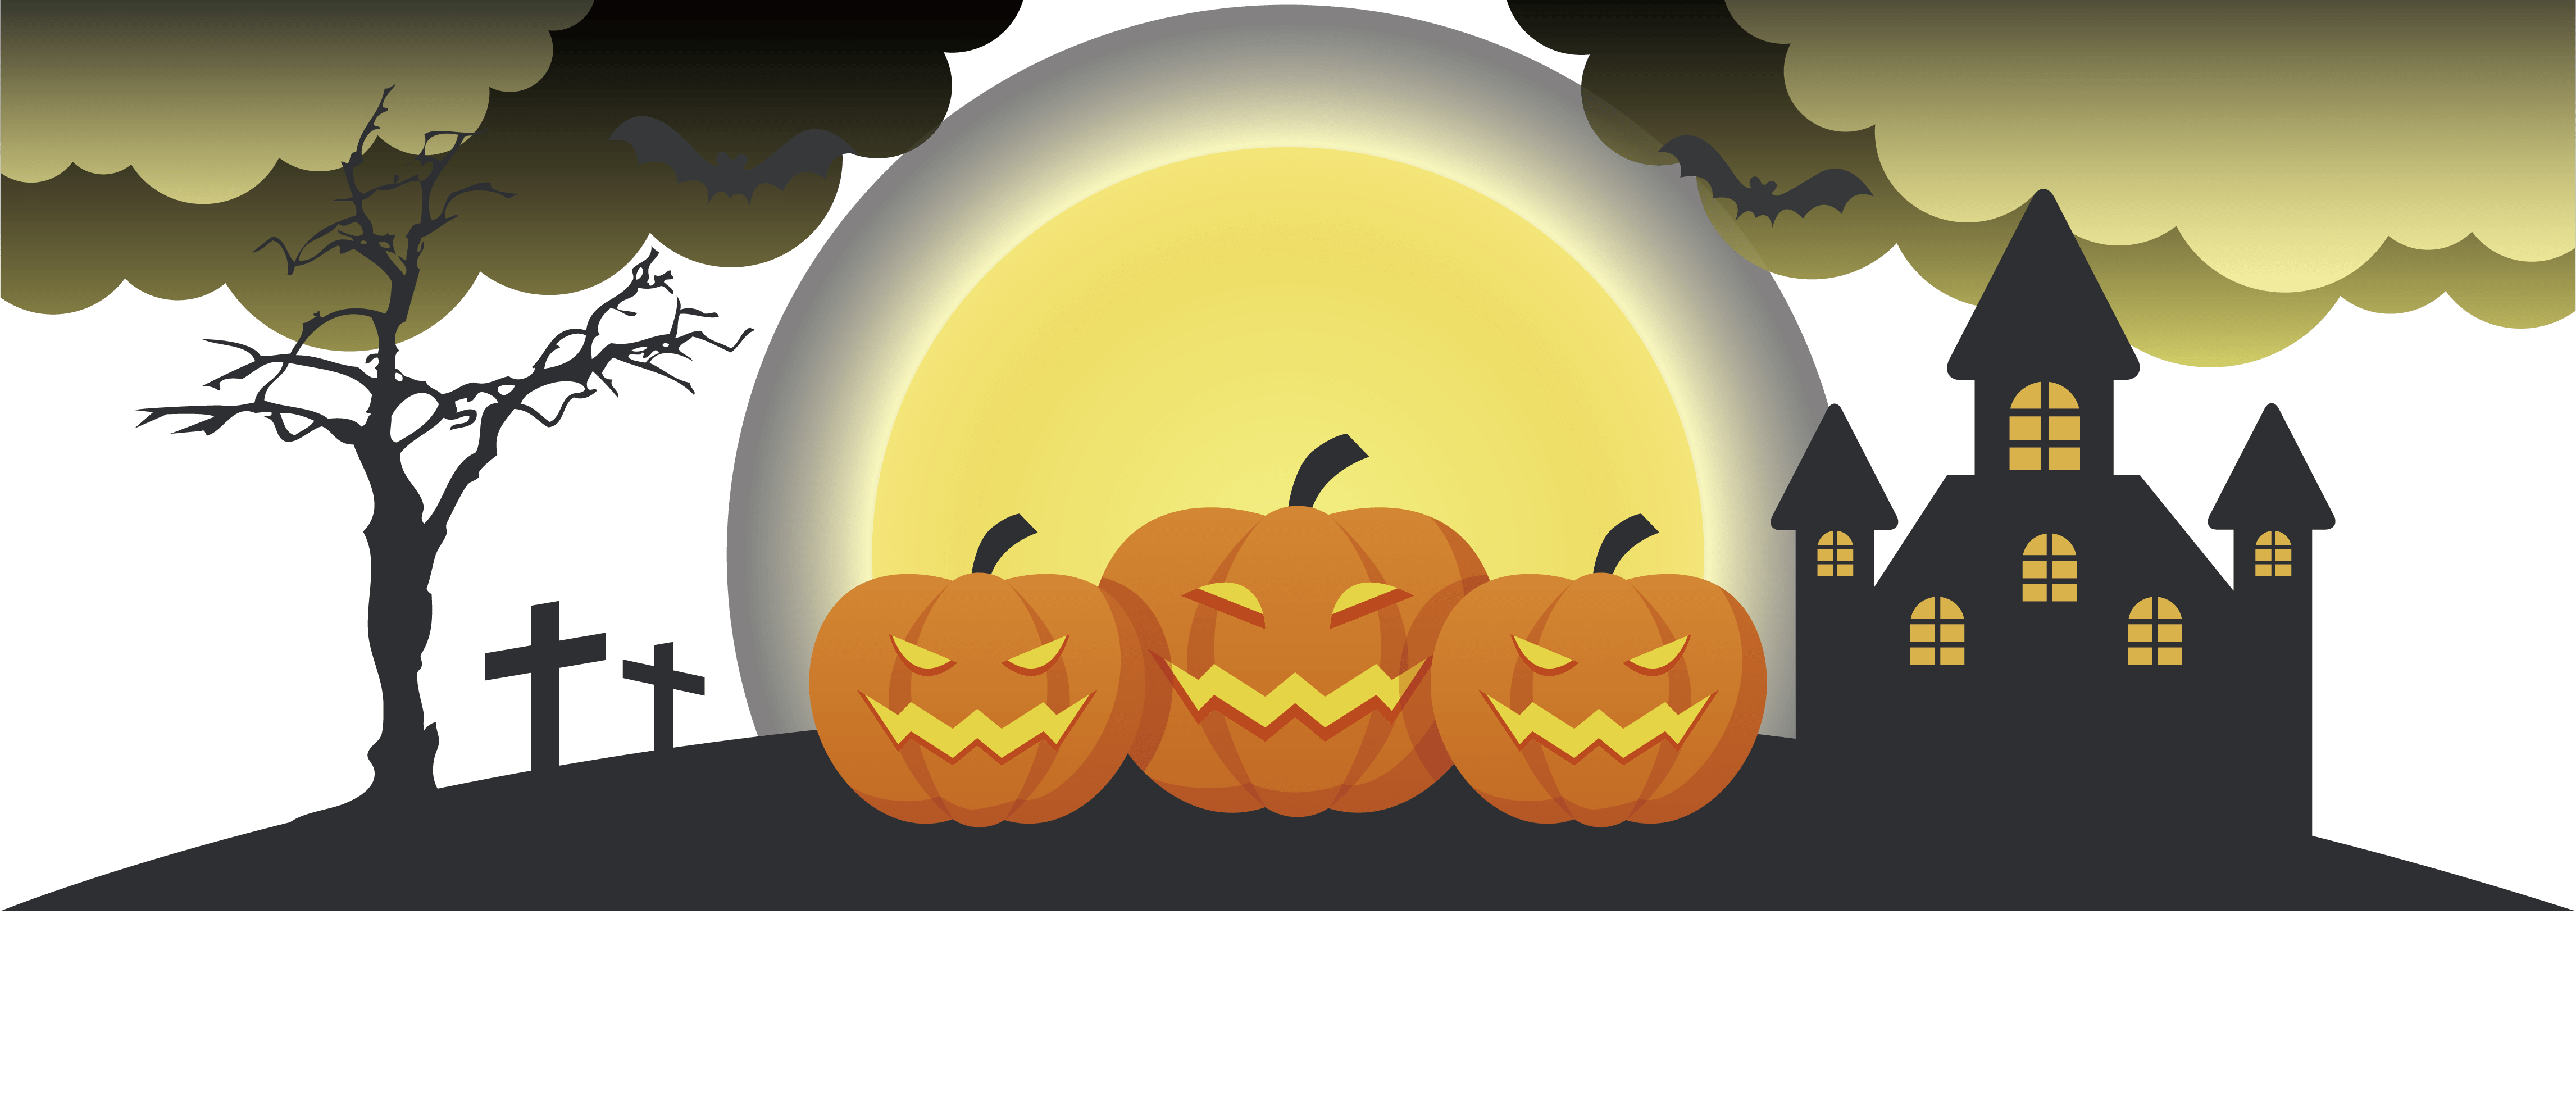 October Pack Meeting Halloween ThemedPack 815 | Edgewater, MD